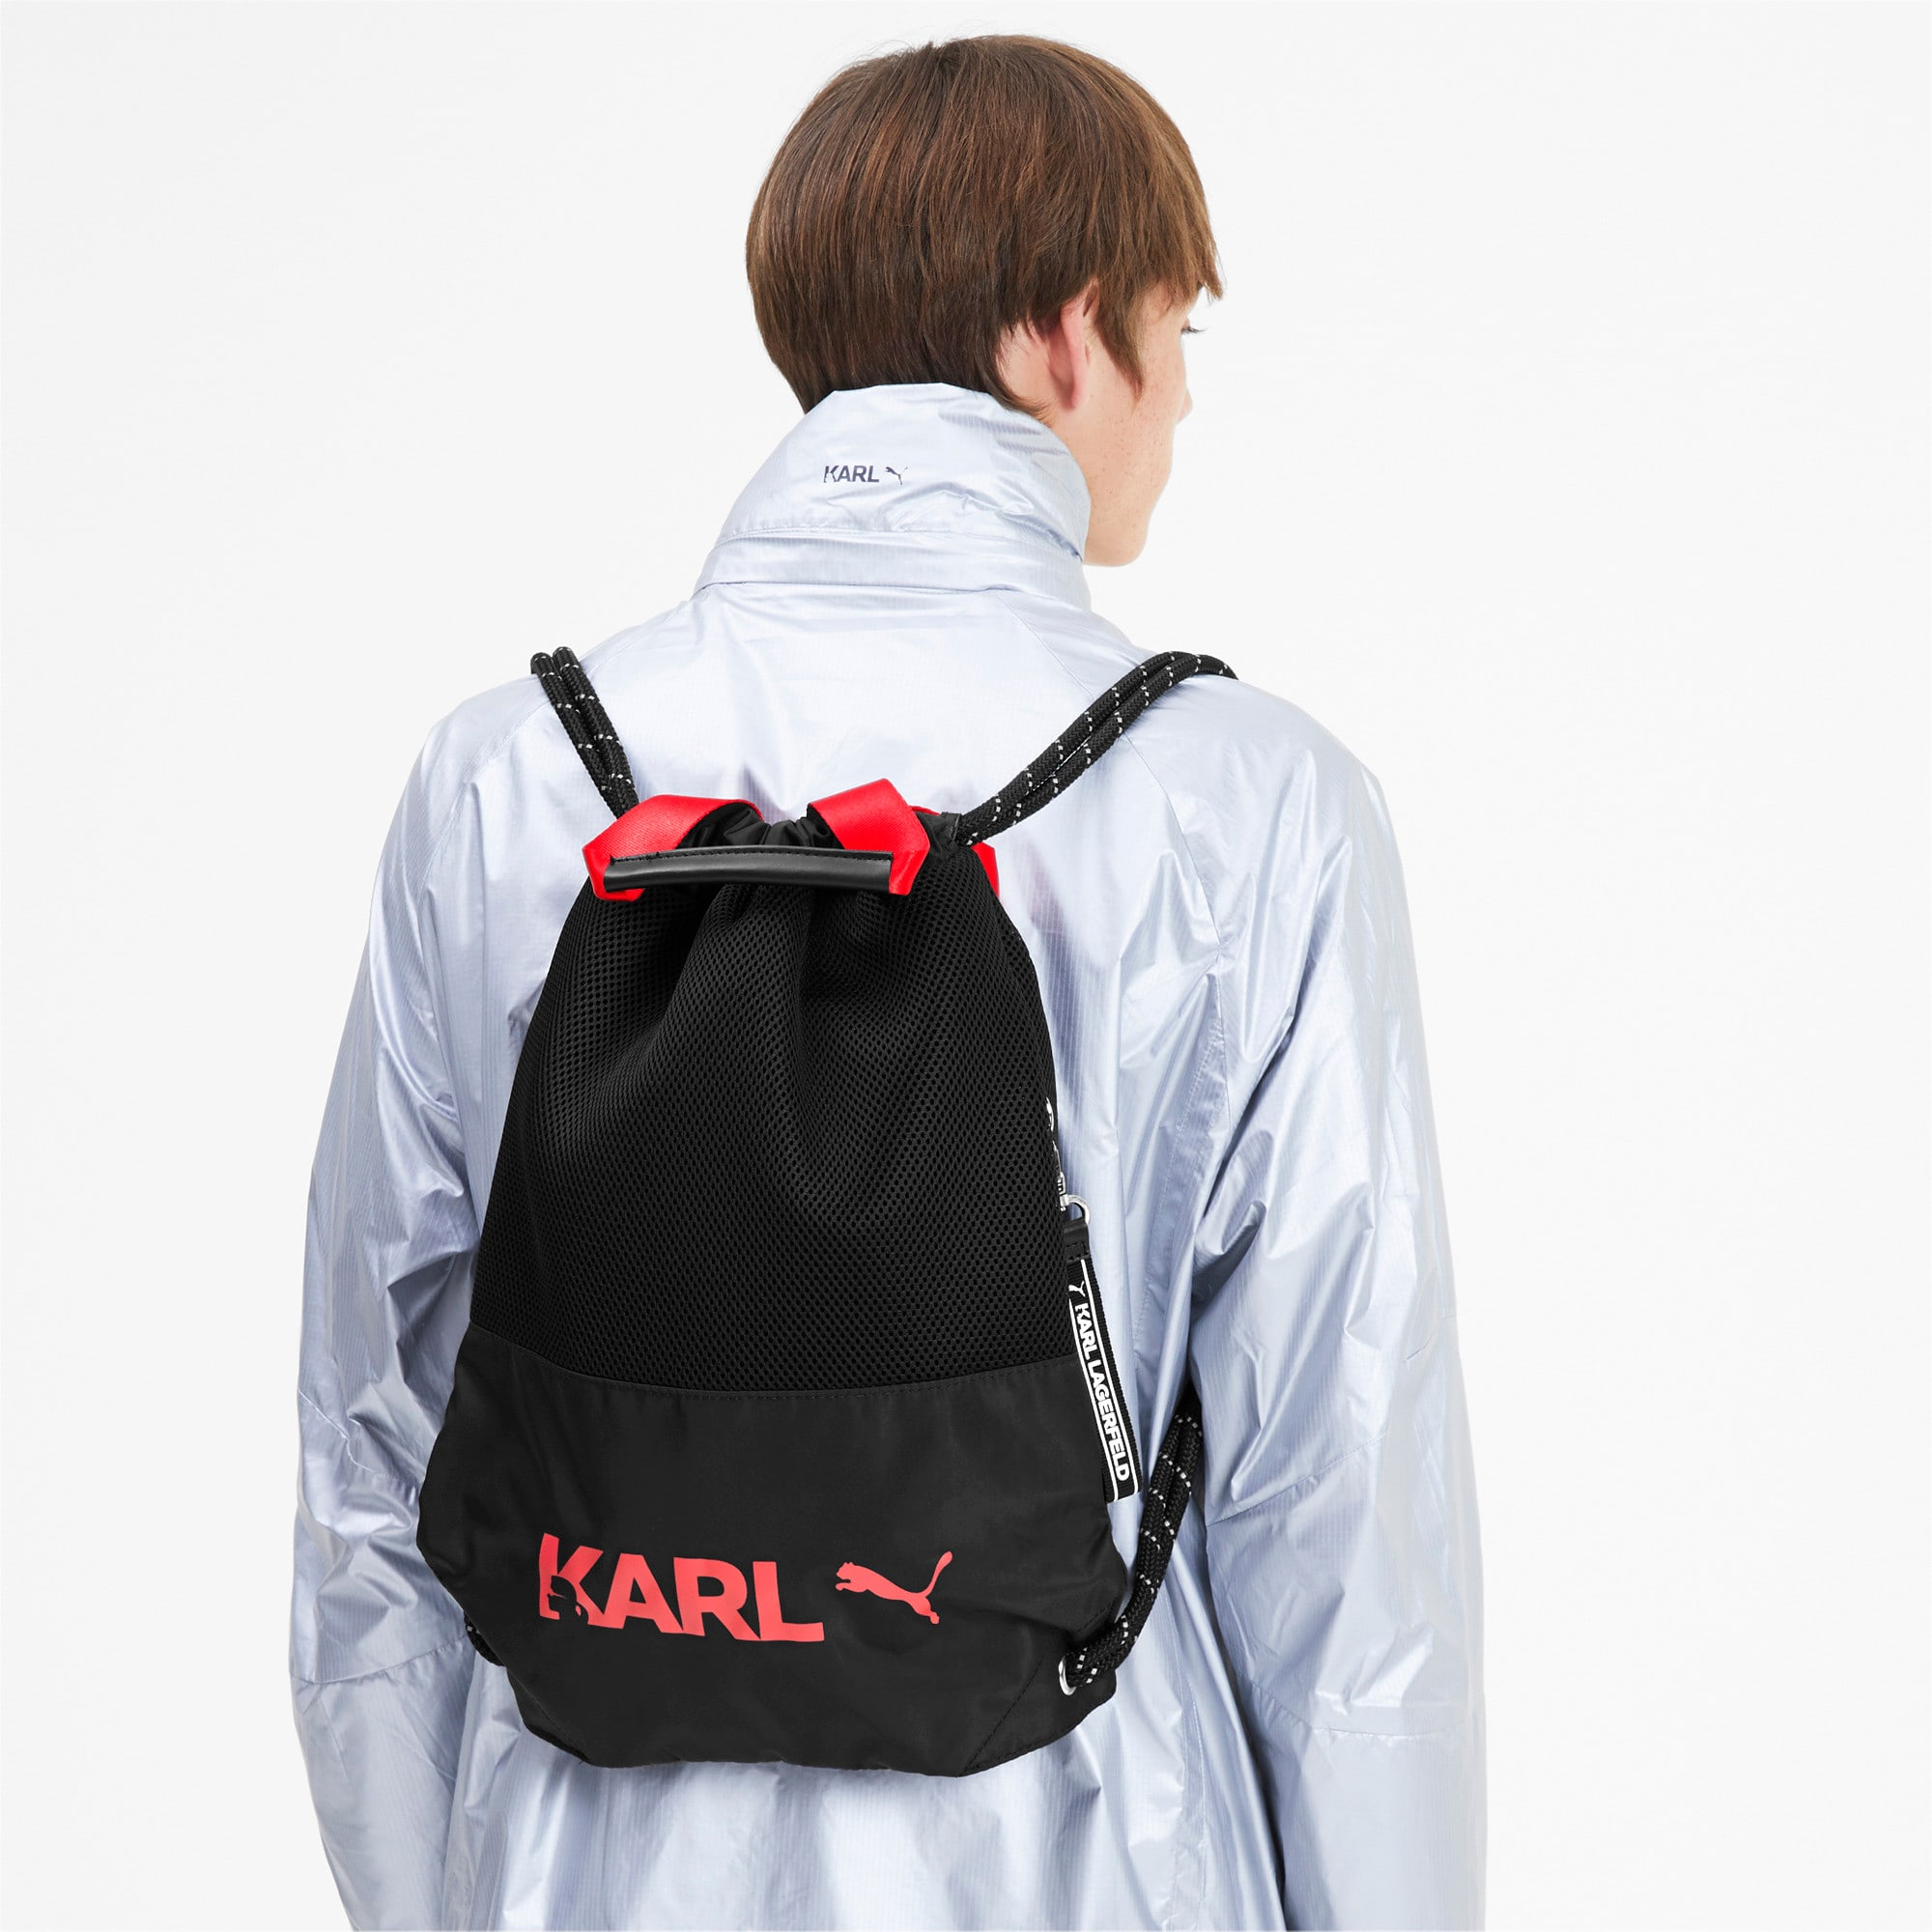 Thumbnail 2 of PUMA x KARL LAGERFELD Backpack Tote, Puma Black, medium